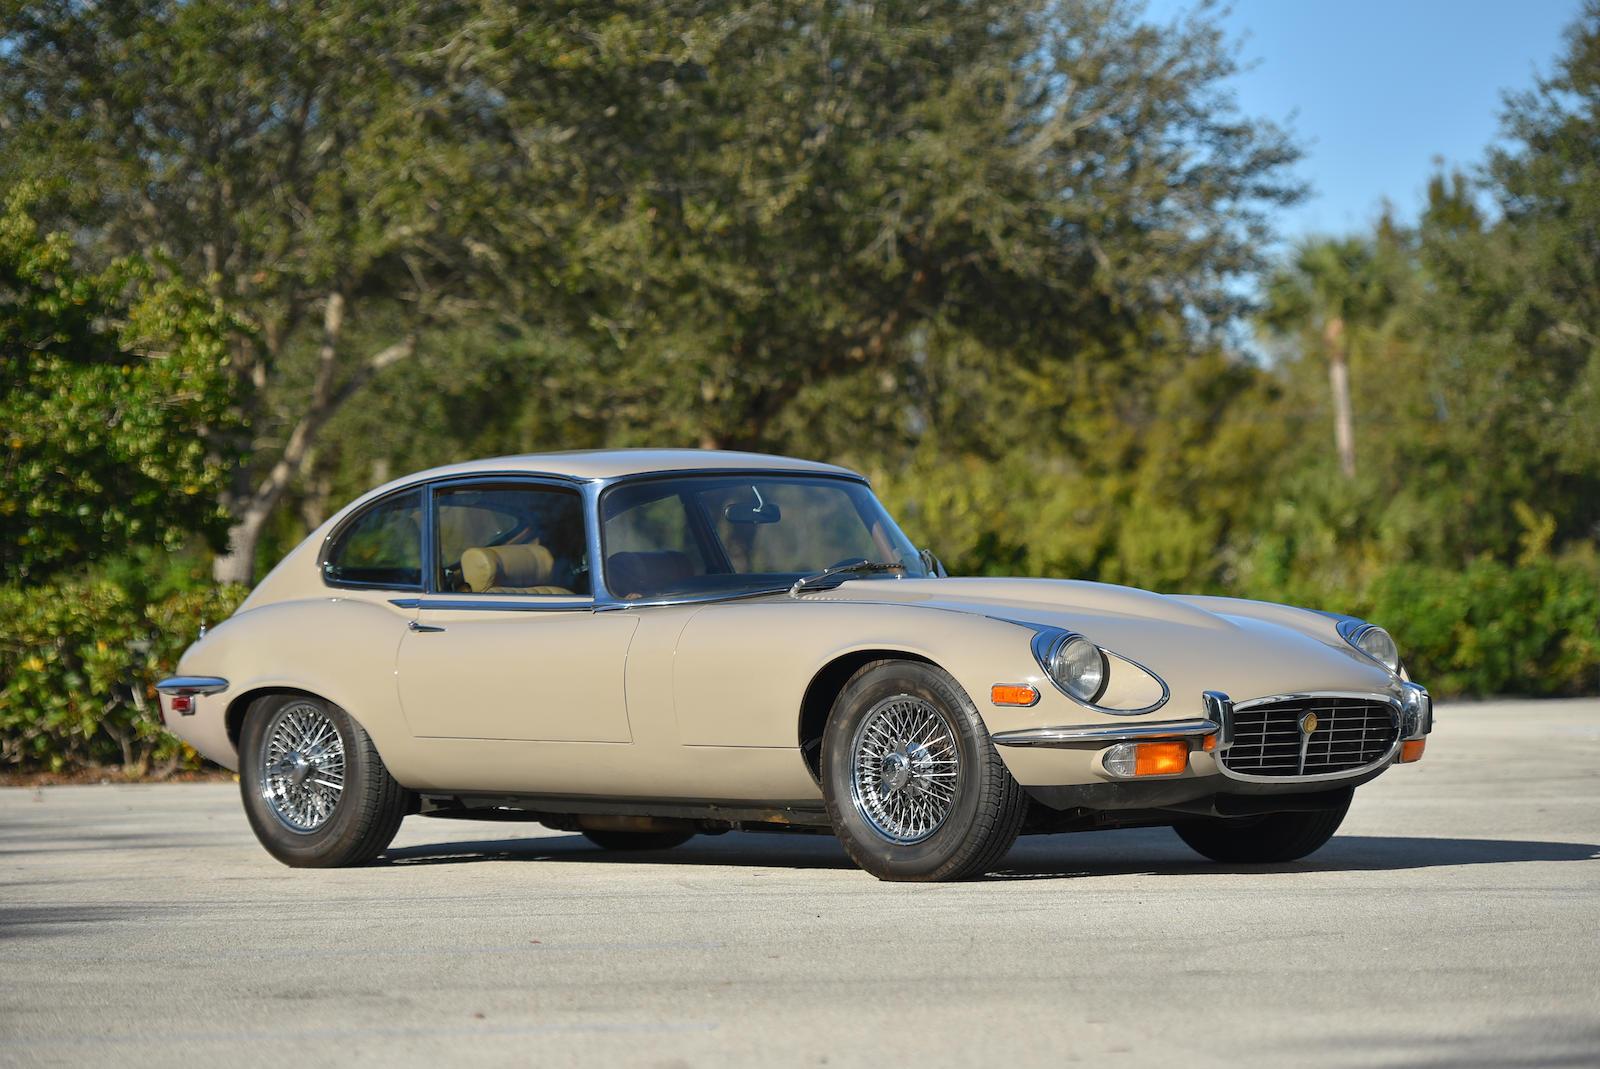 1972 Jaguar E-Type SIII Coupe